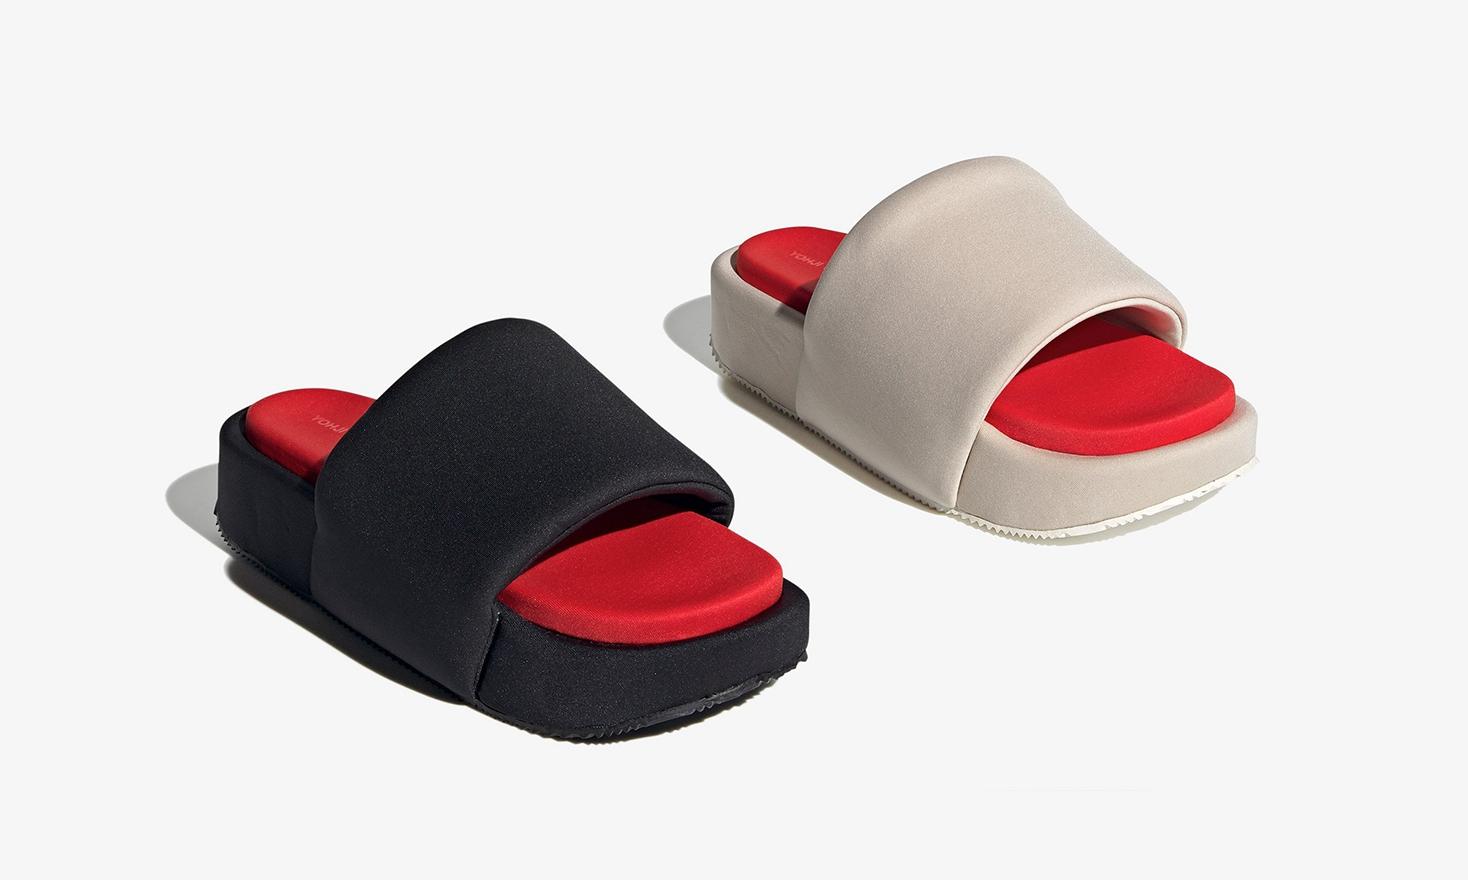 adidas Y-3 推出全新夏日拖鞋设计